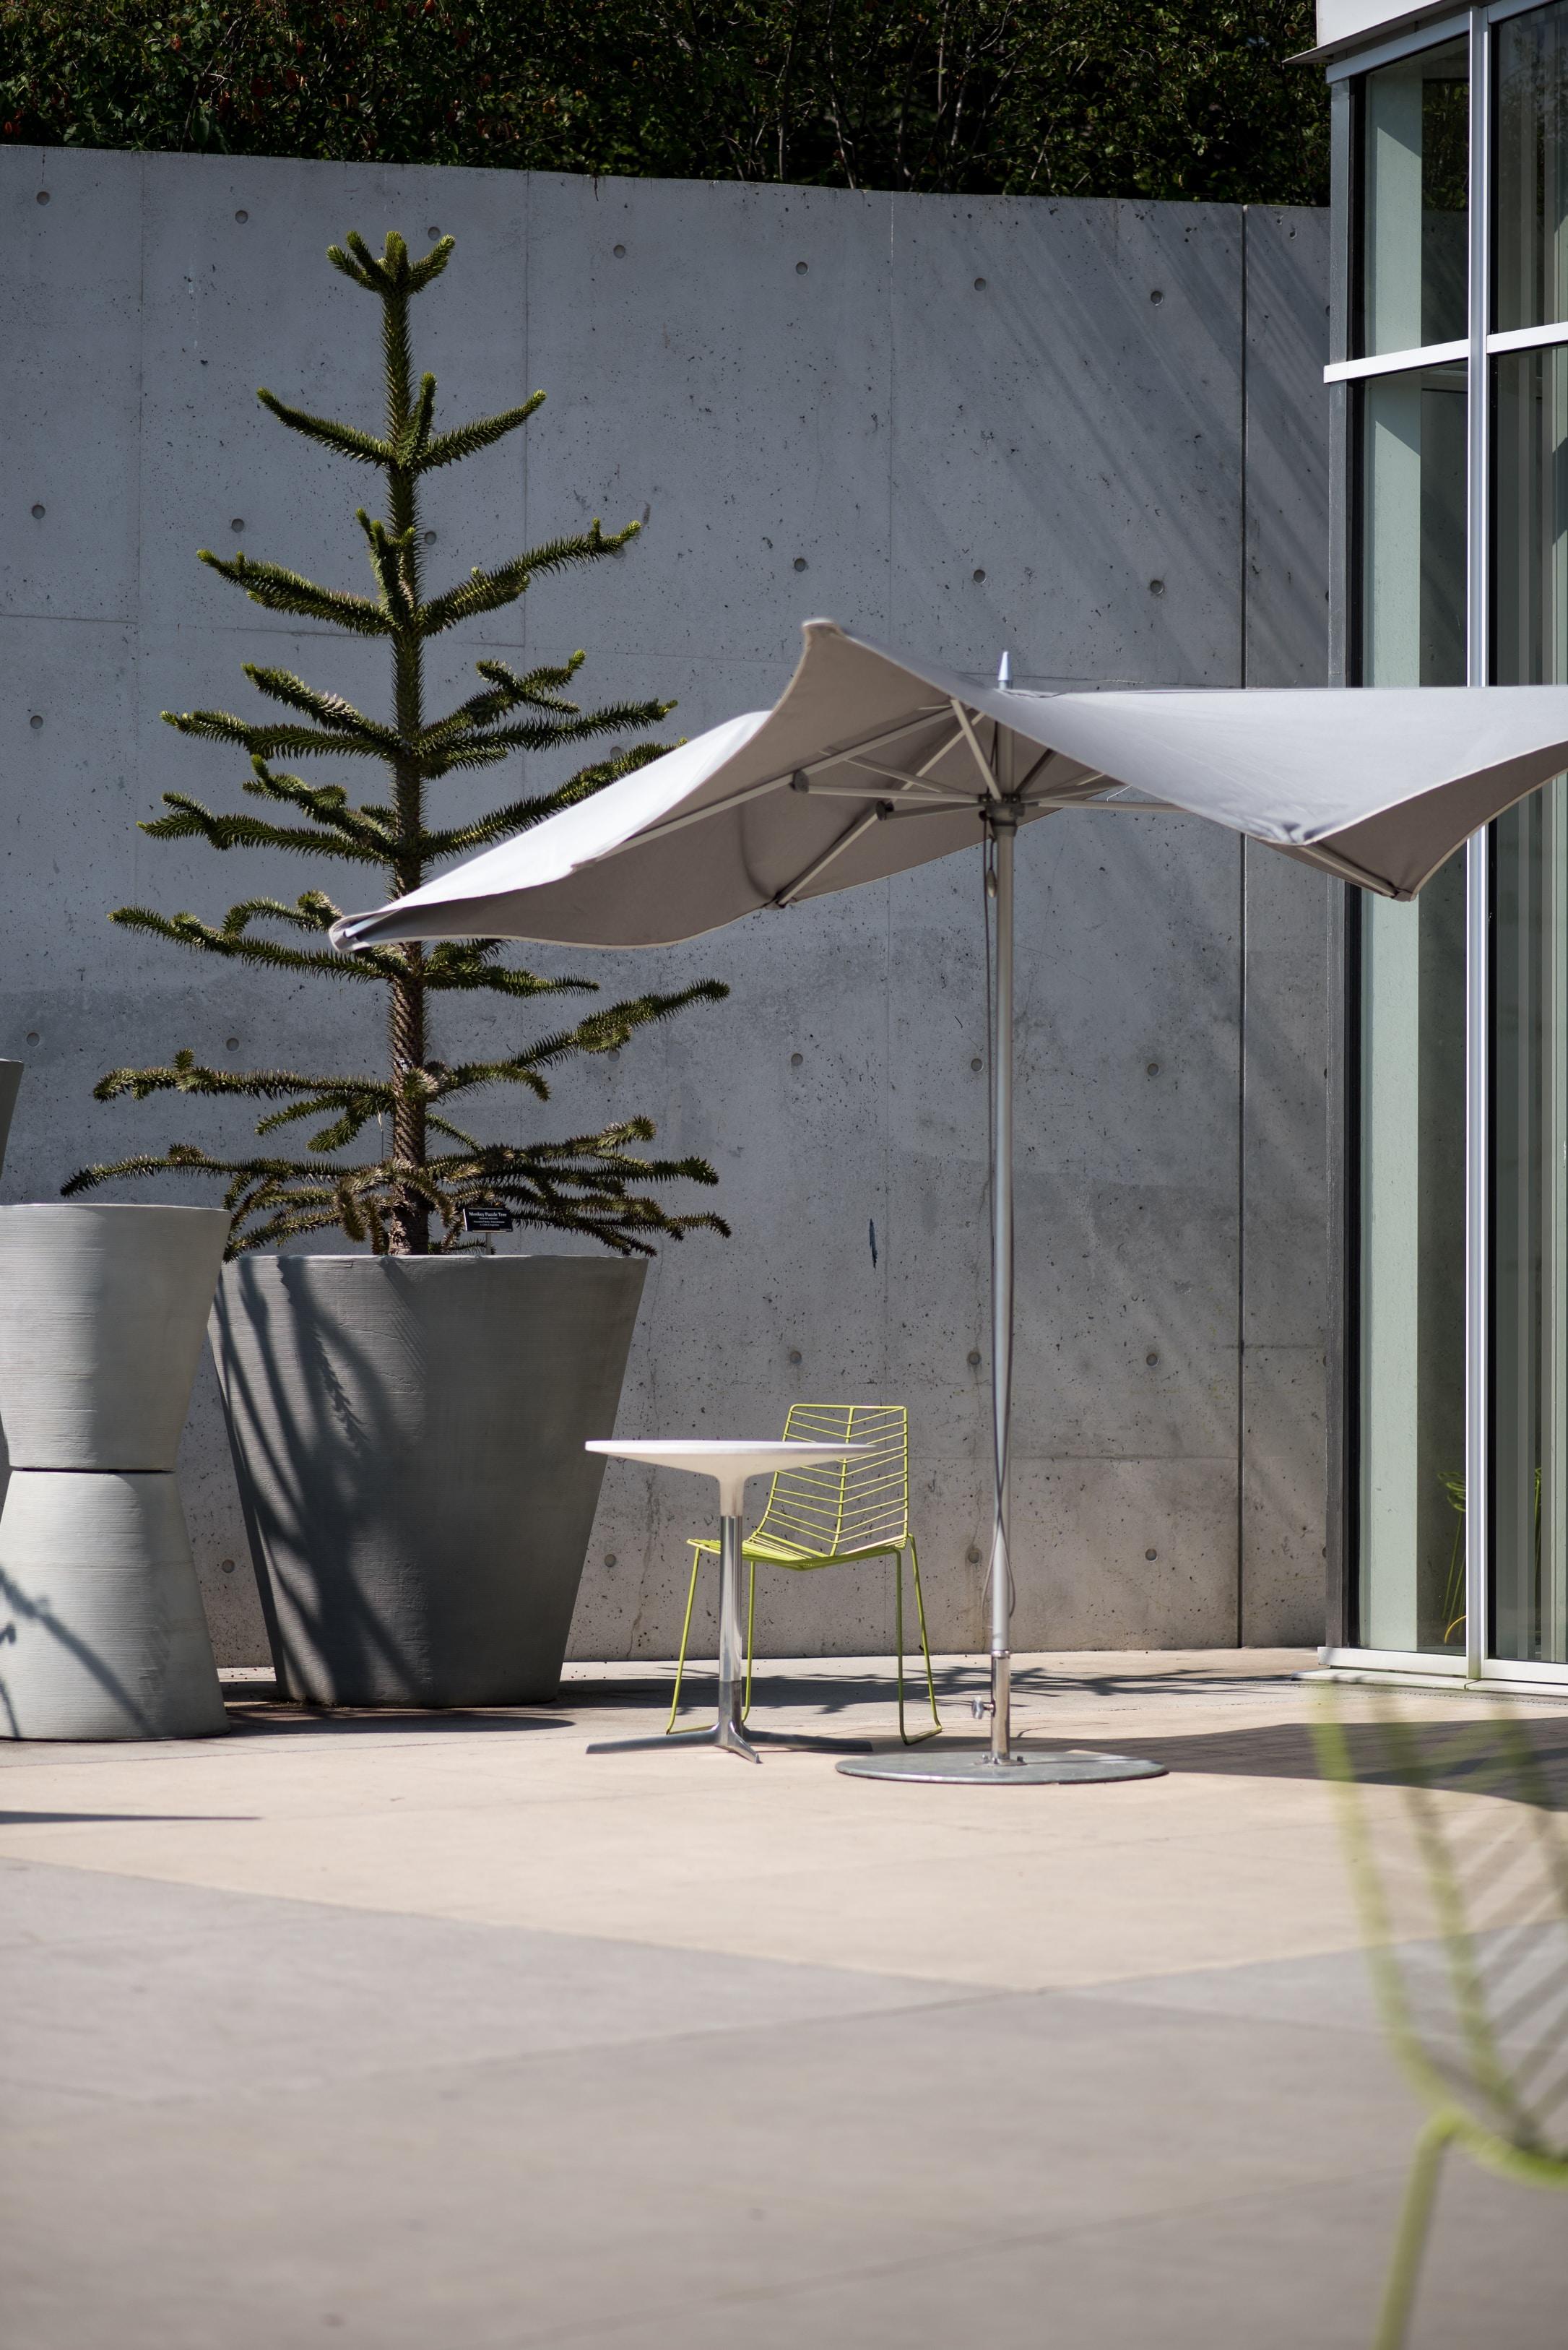 gray patio umbrella beside green pine tree